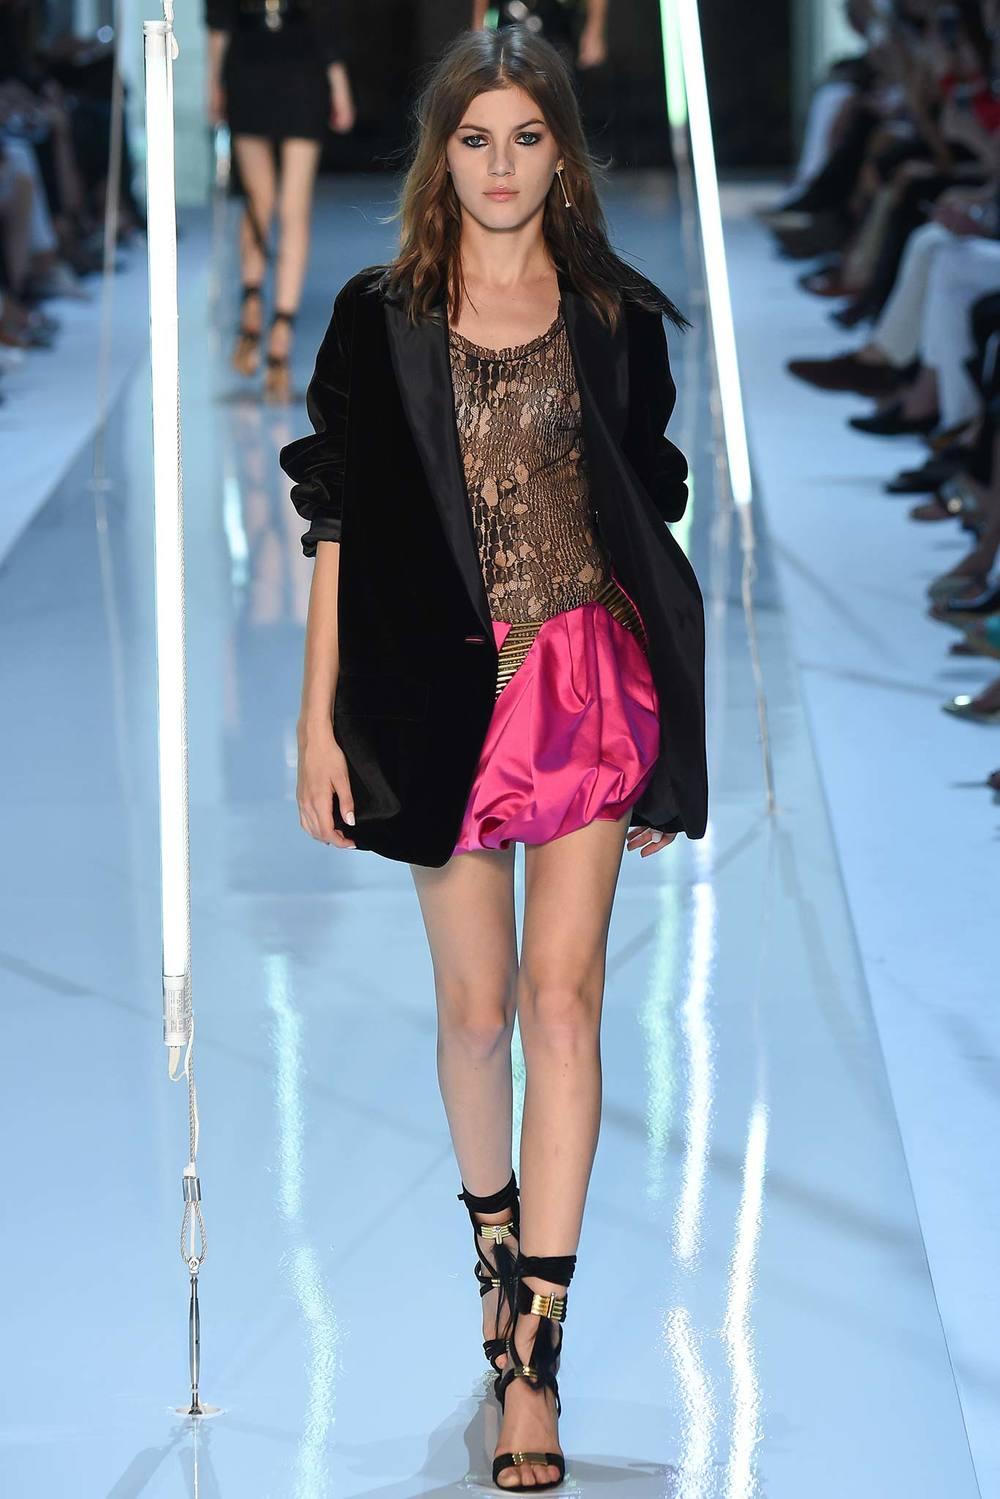 Alexandre-Vauthier-Haute-Couture-FW-2015-Paris-5.jpg